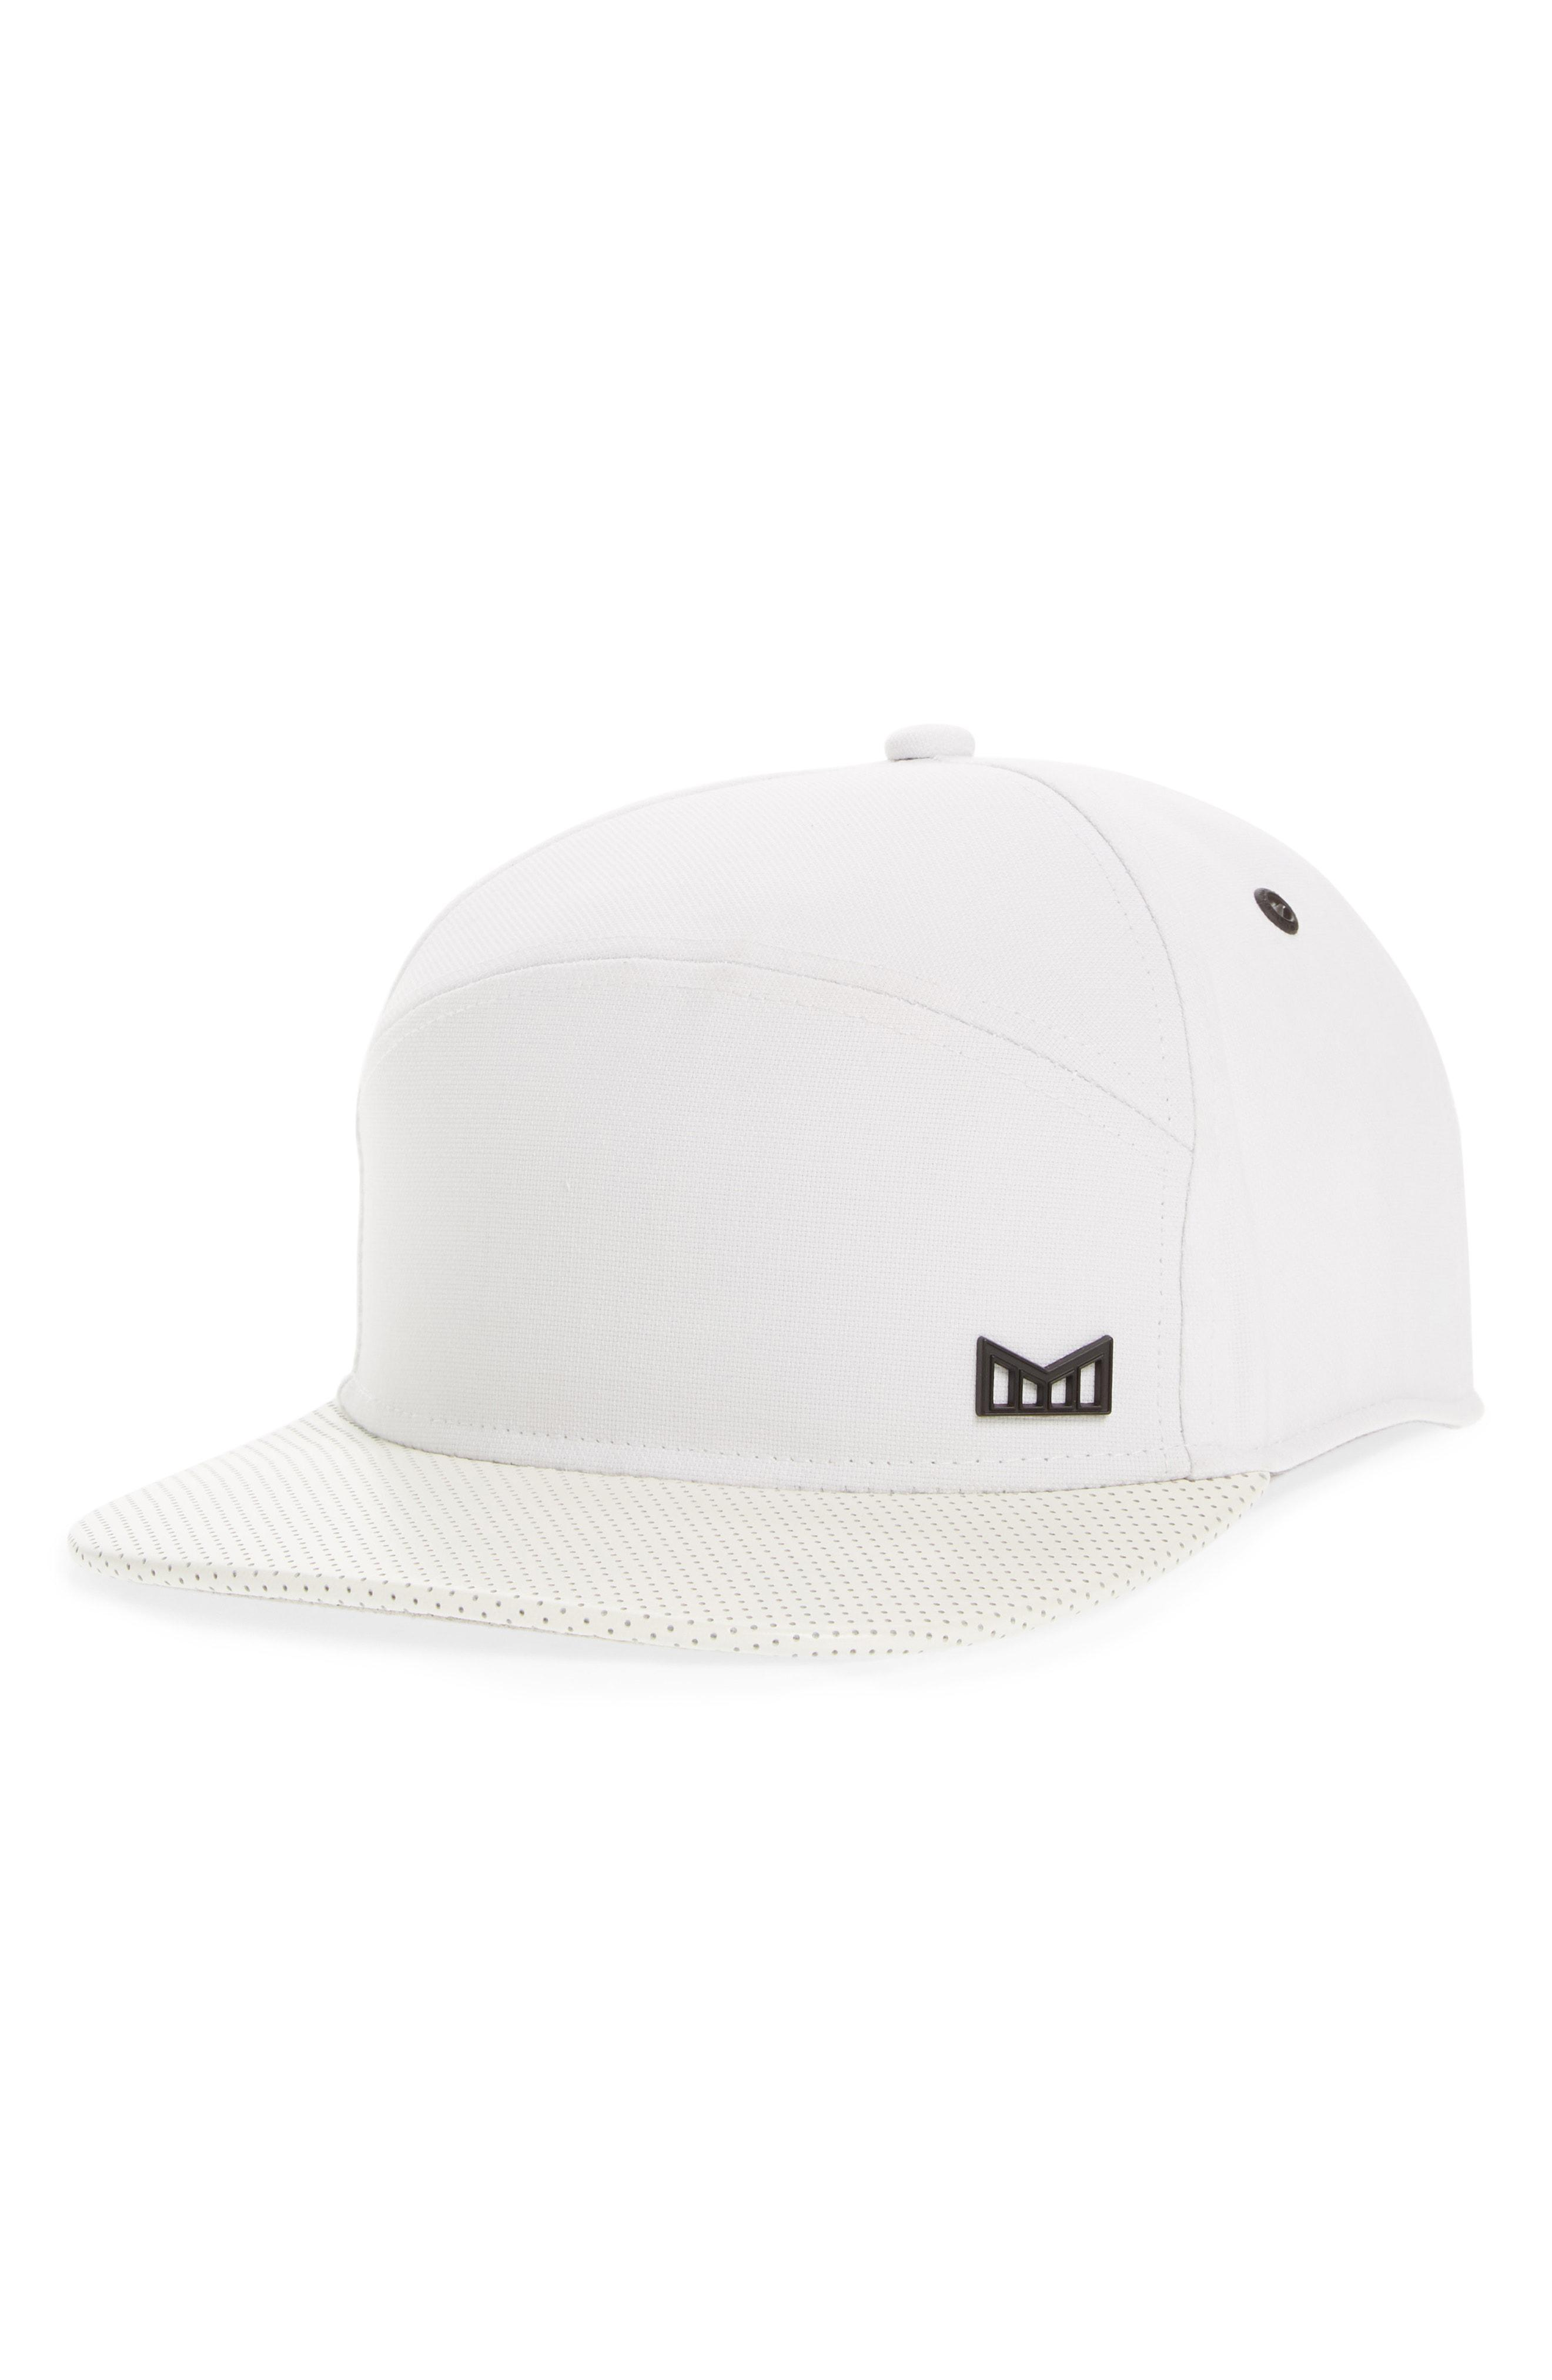 buy online c1ee4 07728 ... promo code lyst melin the vision horizon fit flat brim baseball cap in  3ac67 f86e6